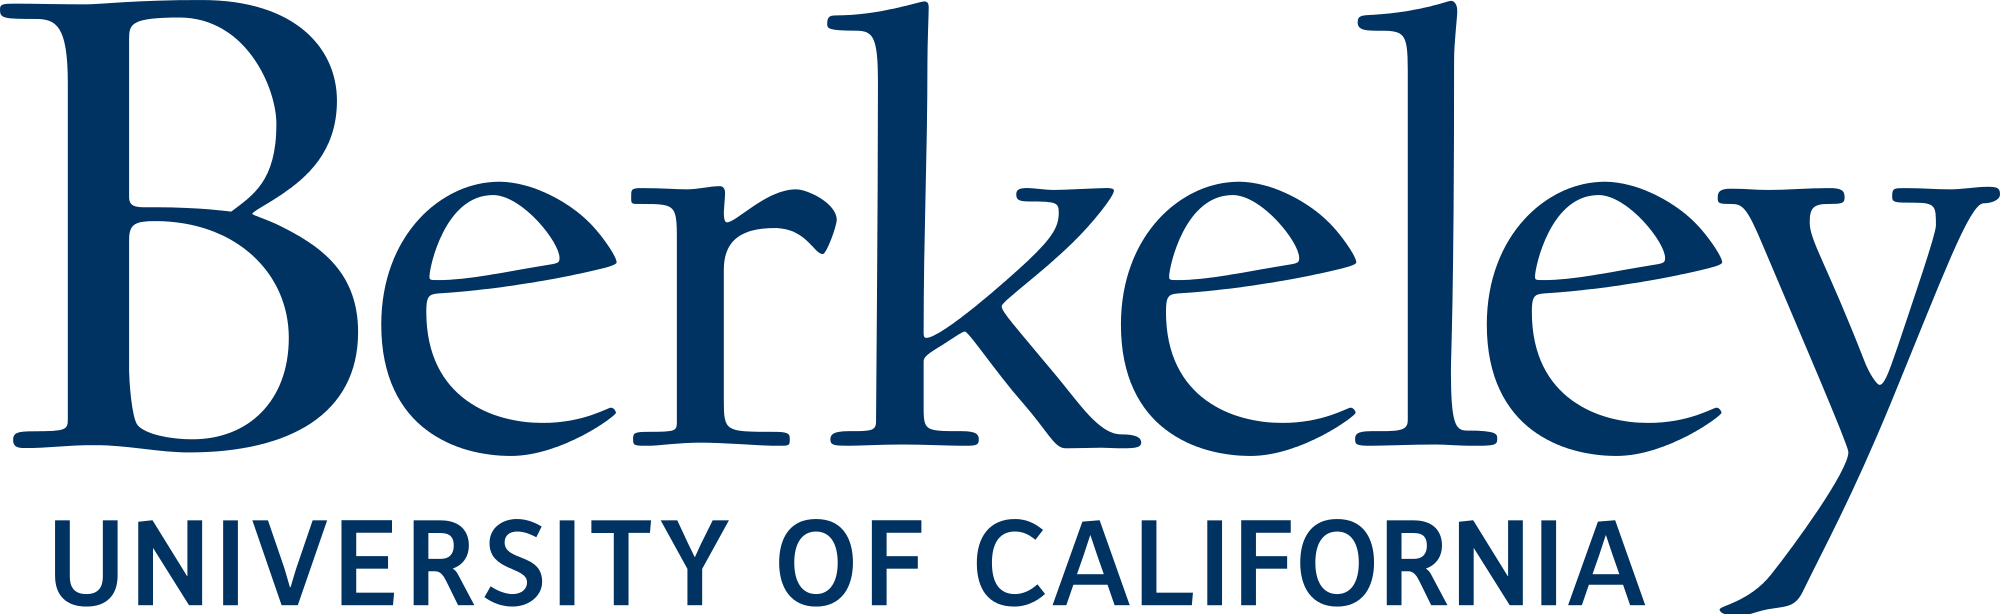 berkeley logo color